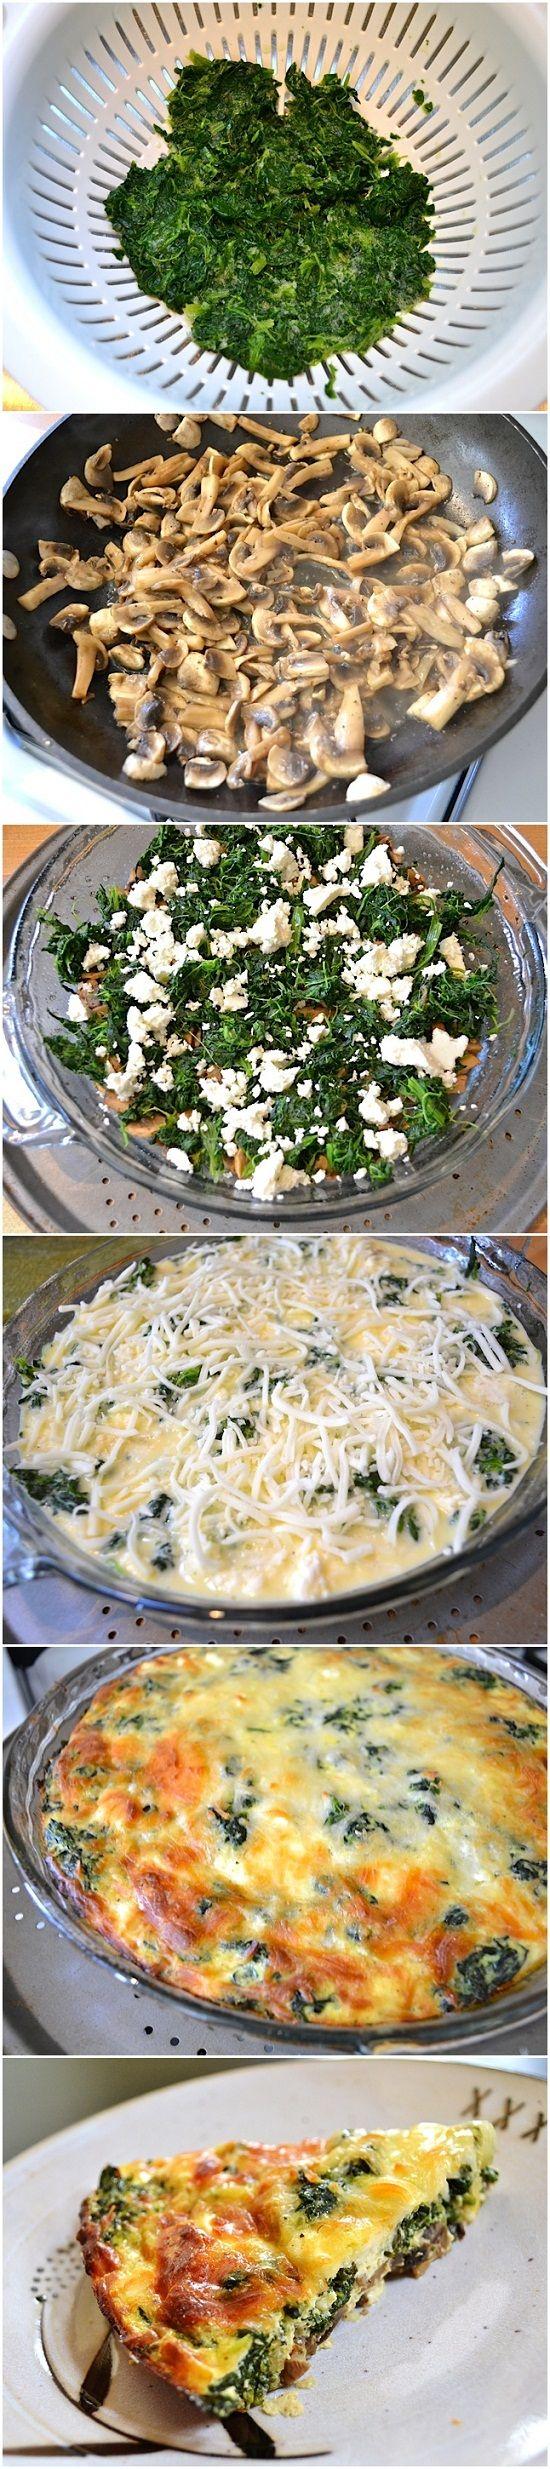 Spinach, Mushroom & Feta Crustless Quiche Replace mozzarella with fresh ball mozzarella to save on processed food.